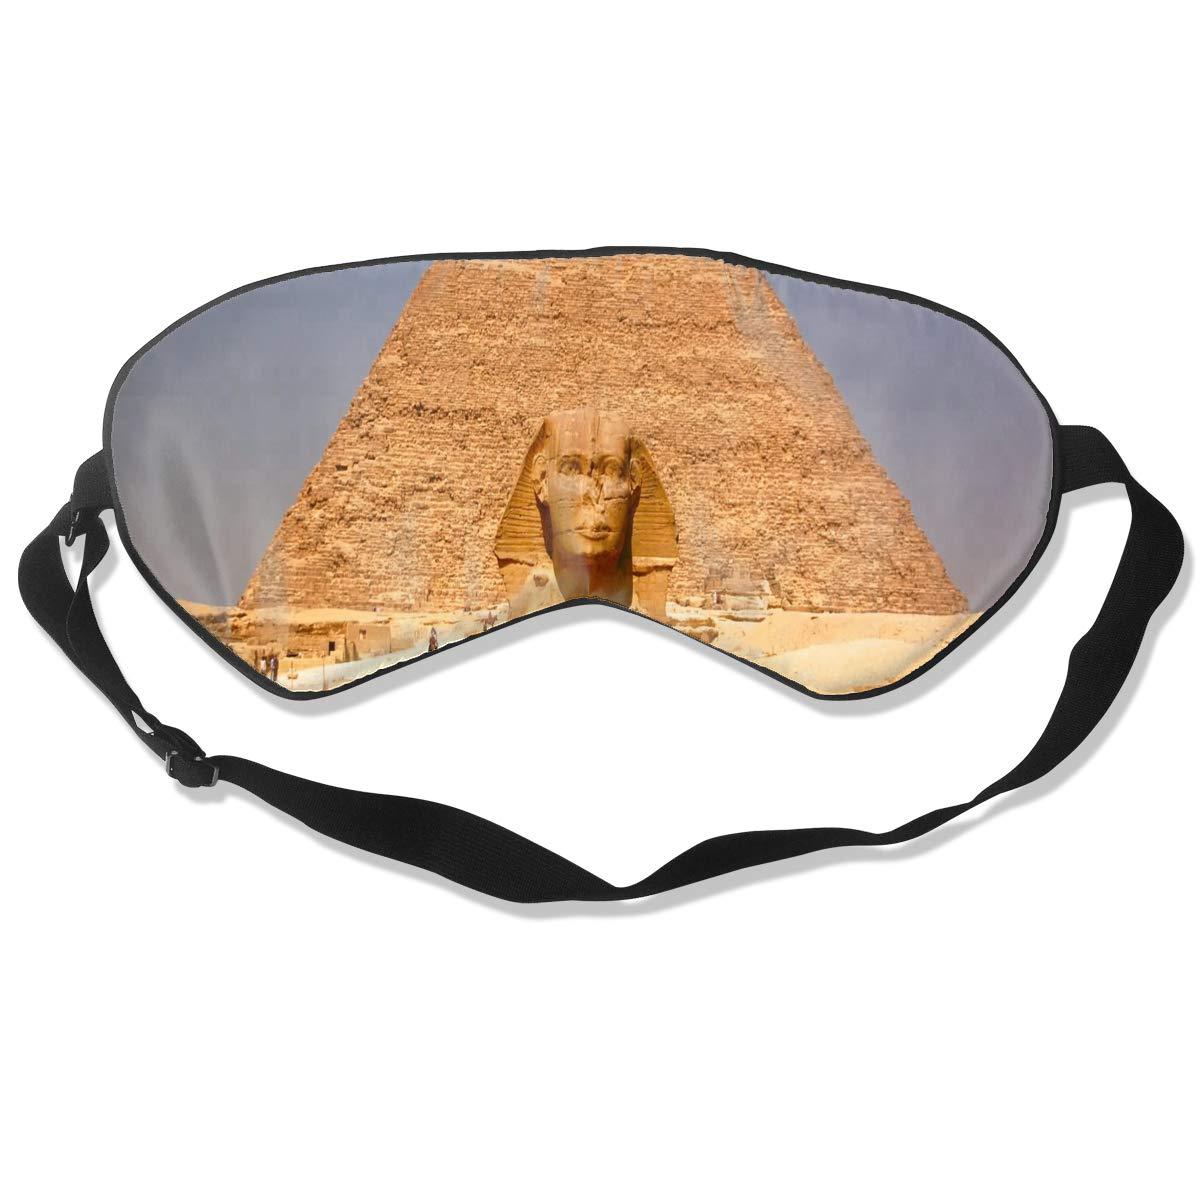 All agree Sleep Mask Eiffel Tower Pink Eye Mask Cover with Adjustable Strap Eyeshade for Travel, Nap, Meditation, Blindfold